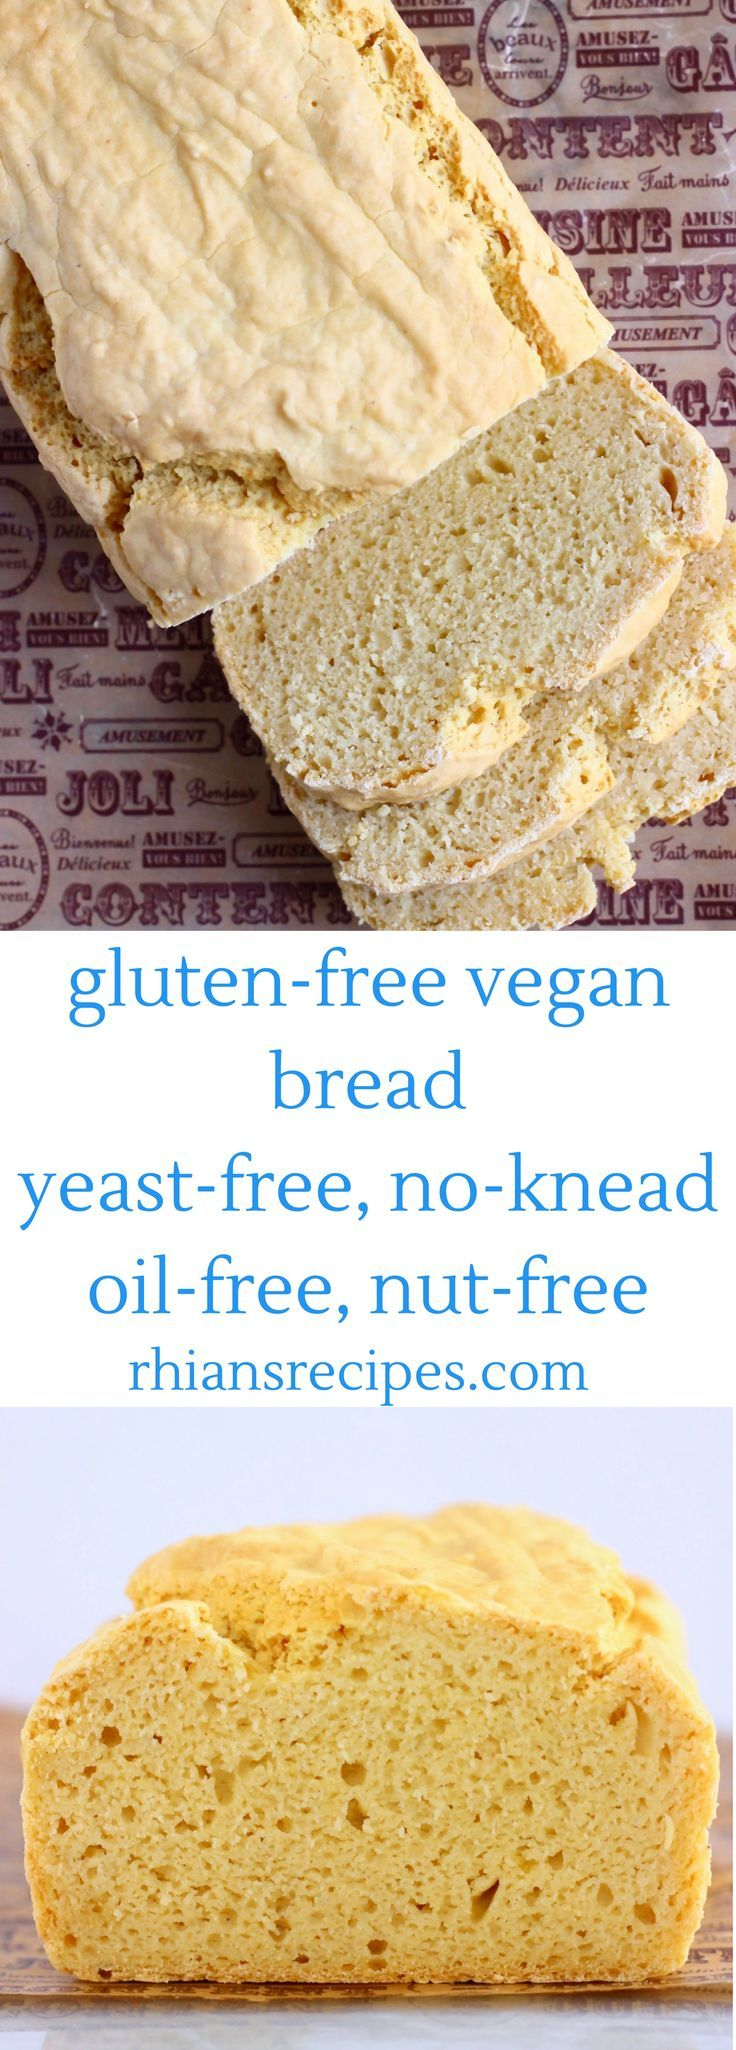 This Gluten-Free Vegan Bread is no-knead, yeast-free ...